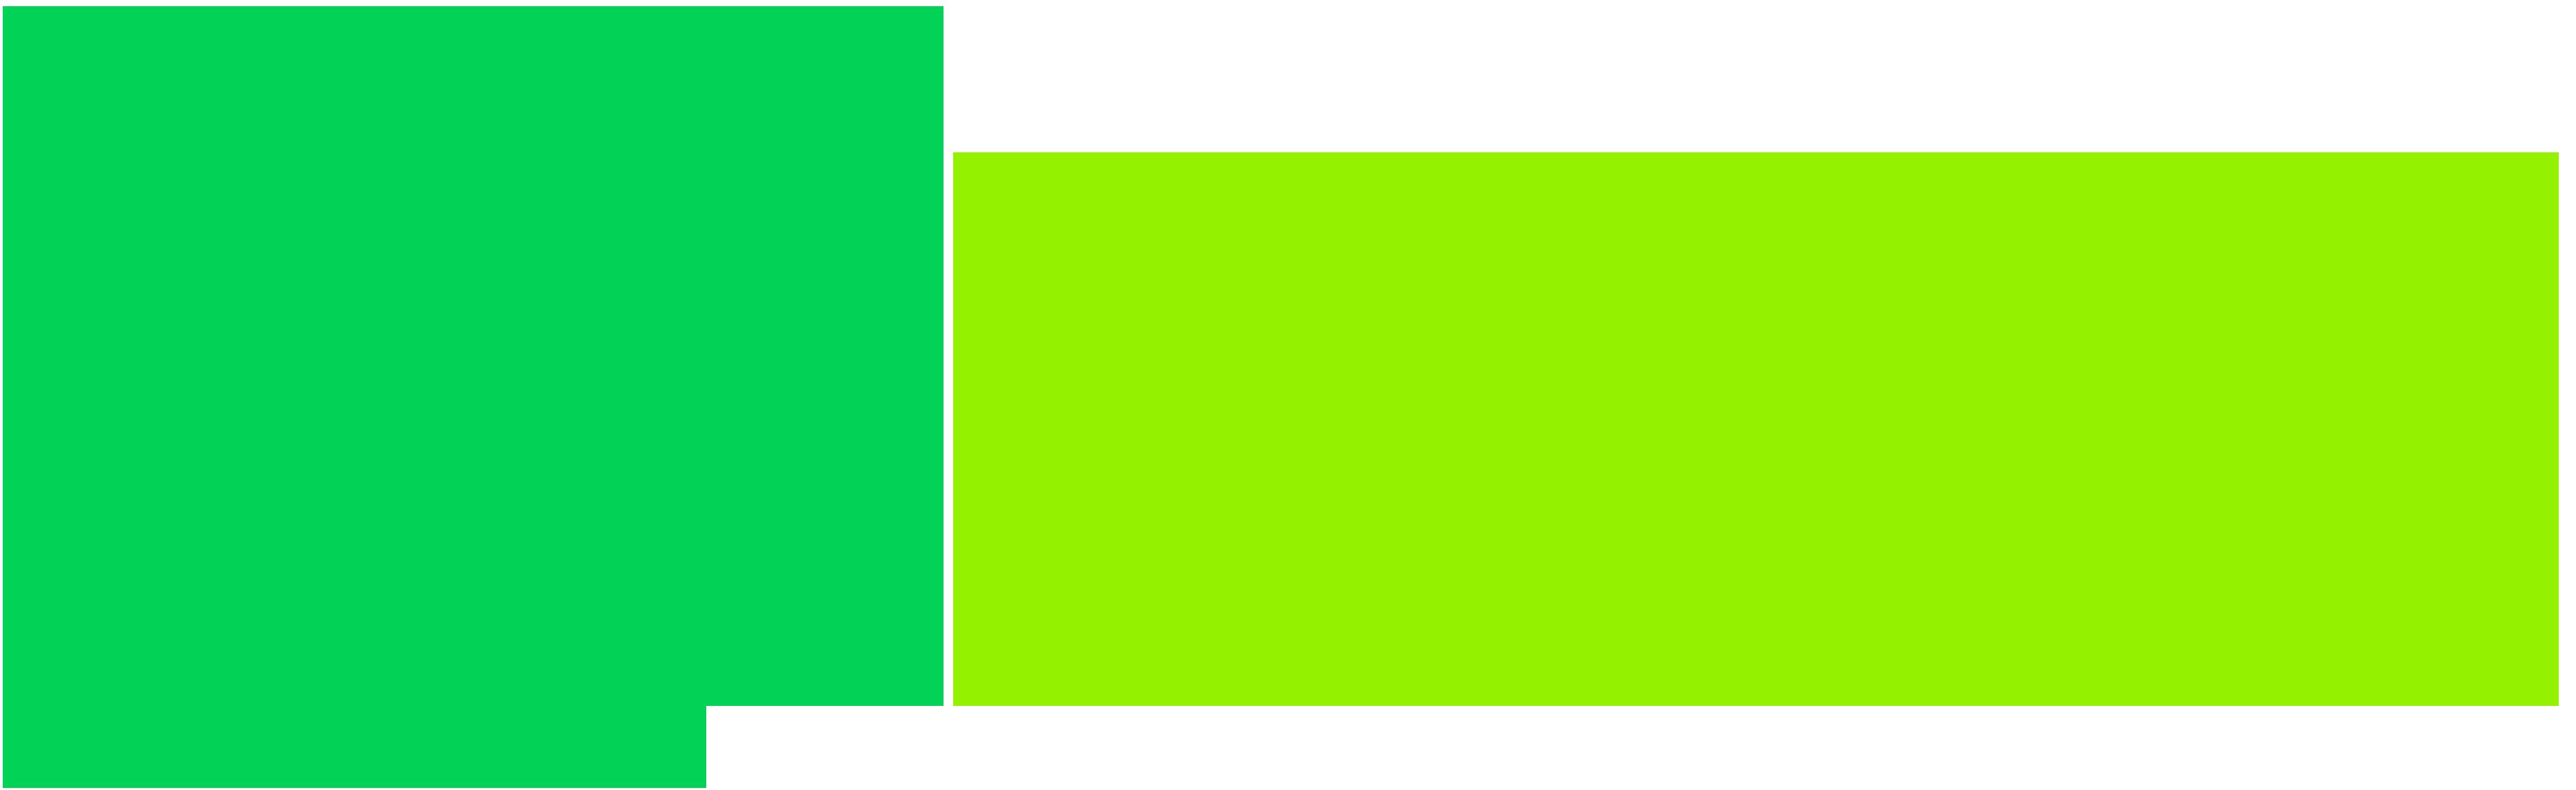 Pixvana Logo